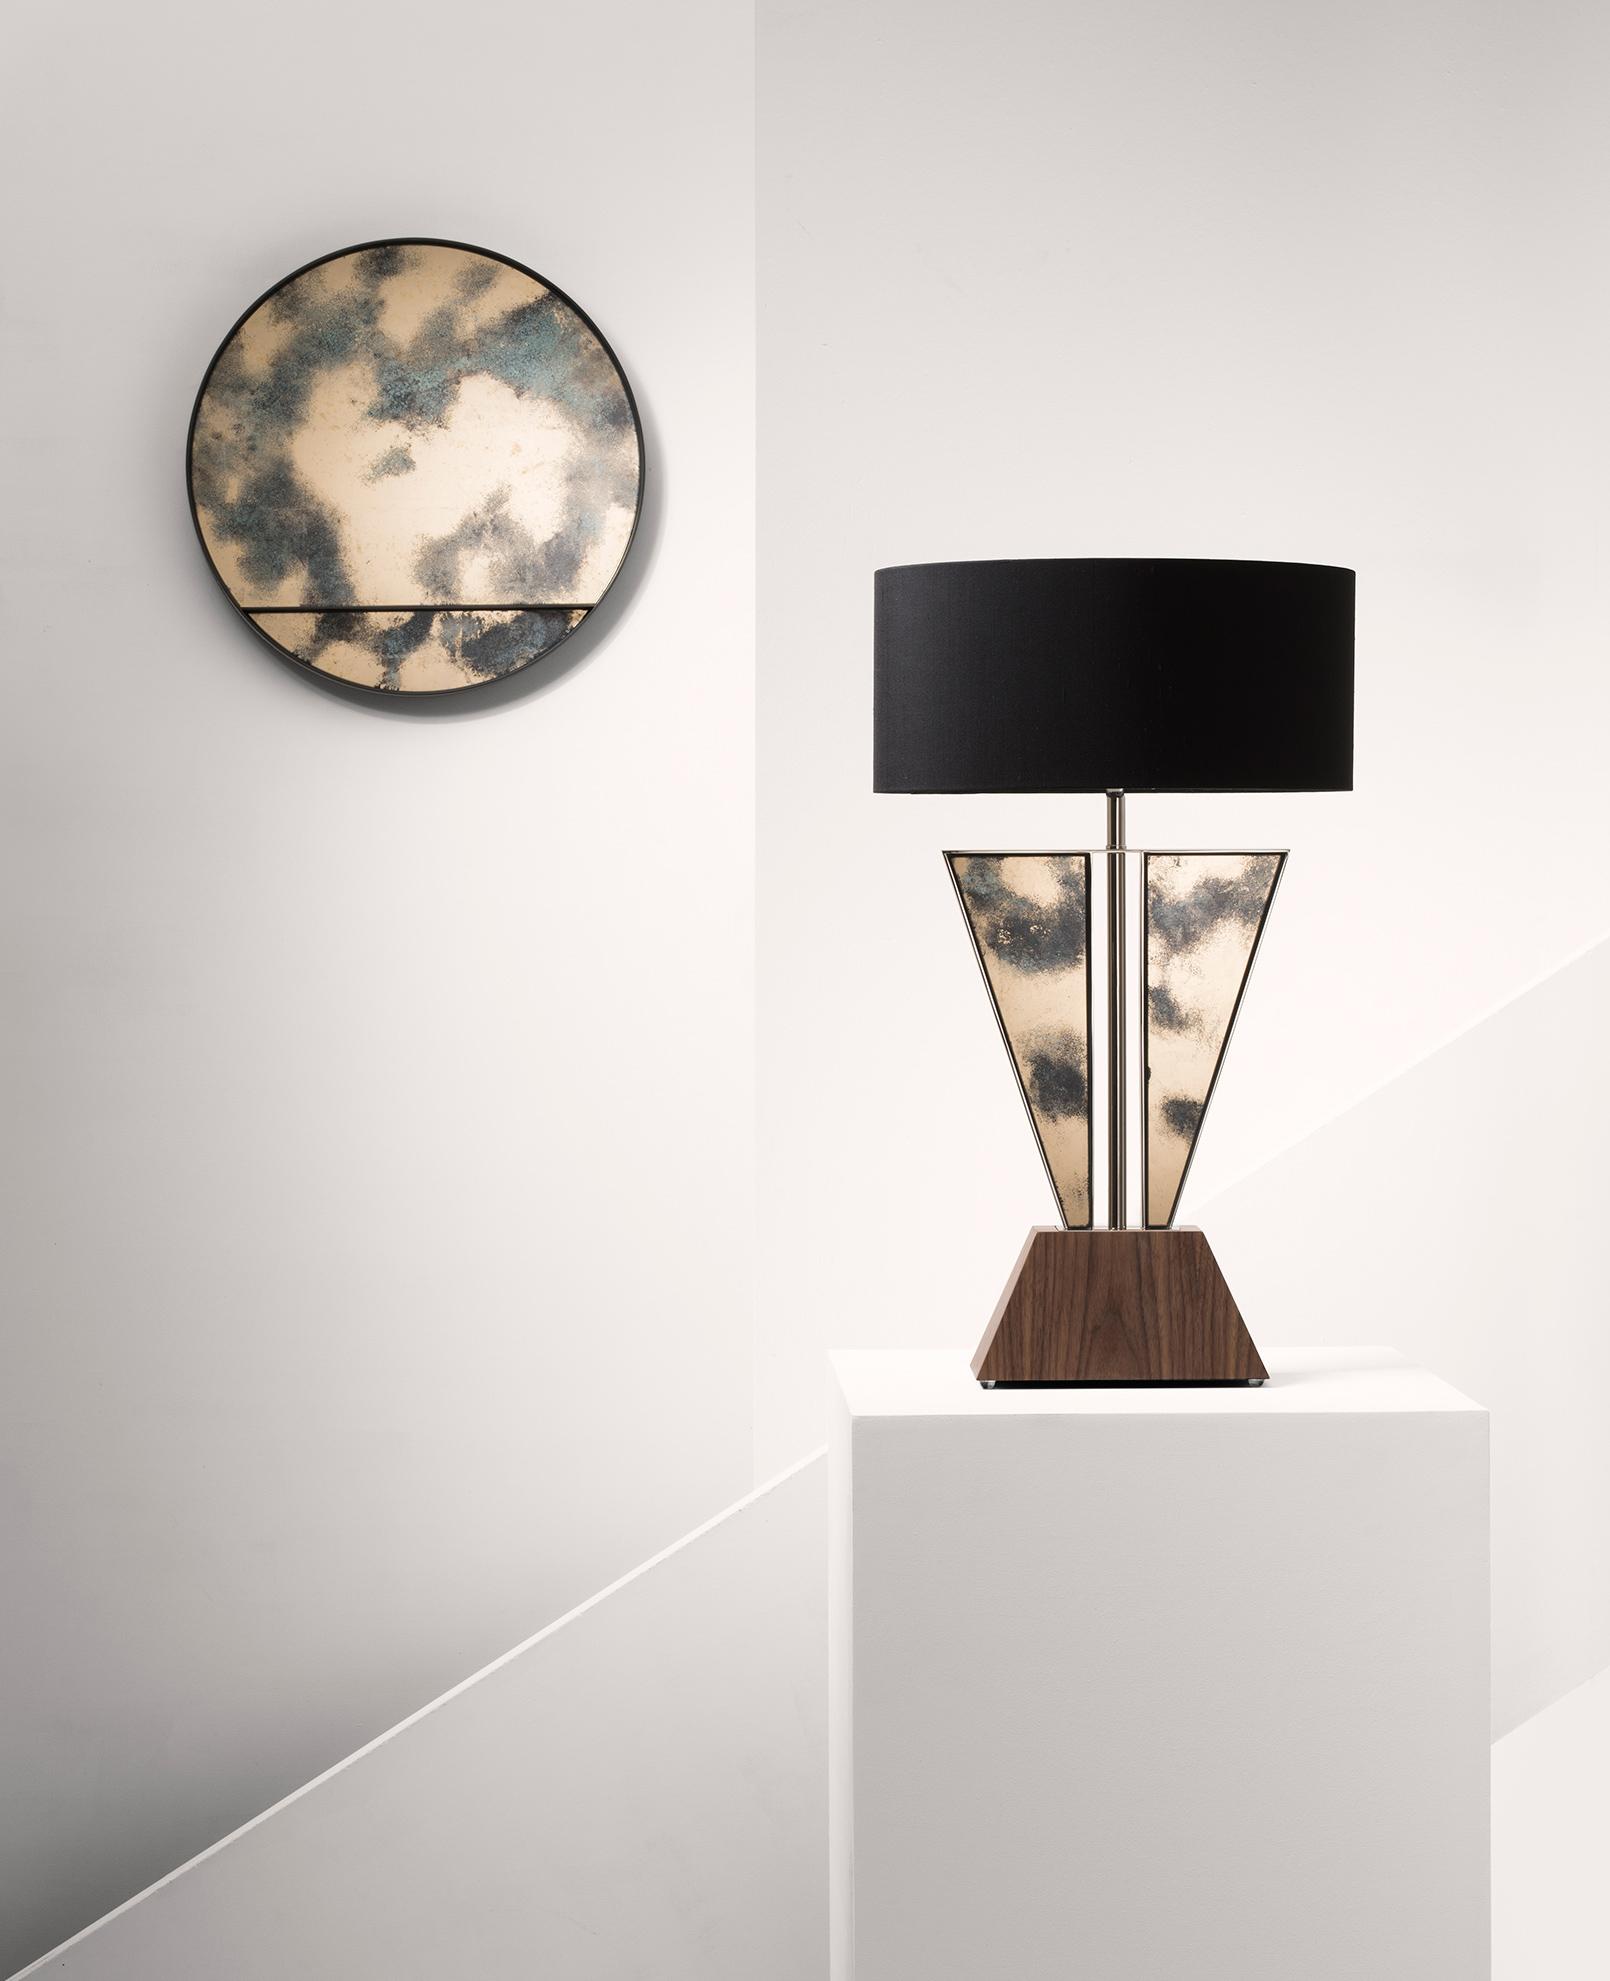 APEX lamp and ORBIT reflector shown here in  Green of Grey  verre églomisé design.